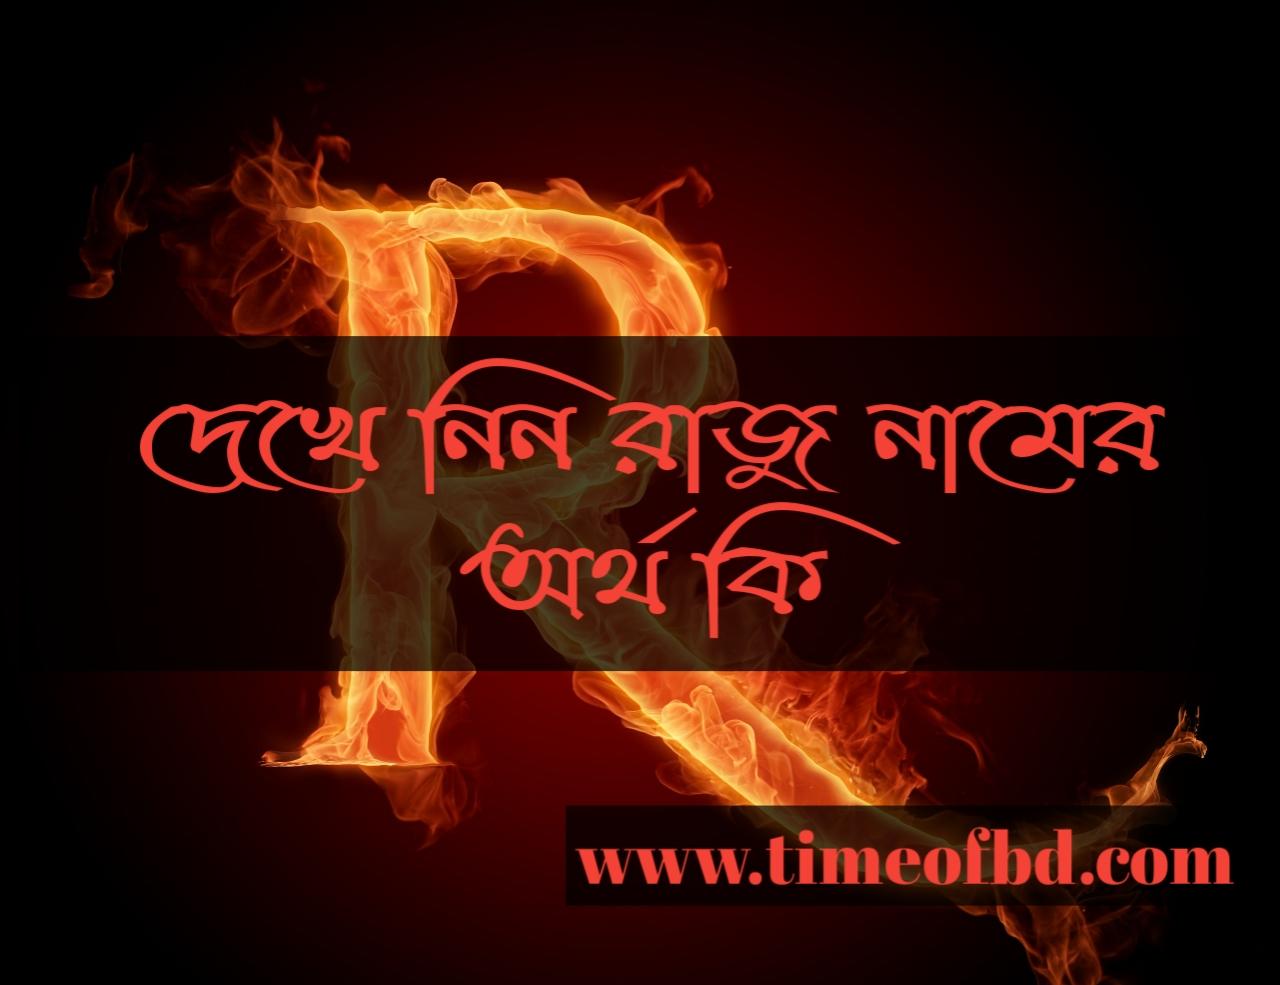 Raju name meaning in Bengali, রাজু নামের অর্থ কি, রাজু নামের বাংলা অর্থ কি, রাজু নামের ইসলামিক অর্থ কি,